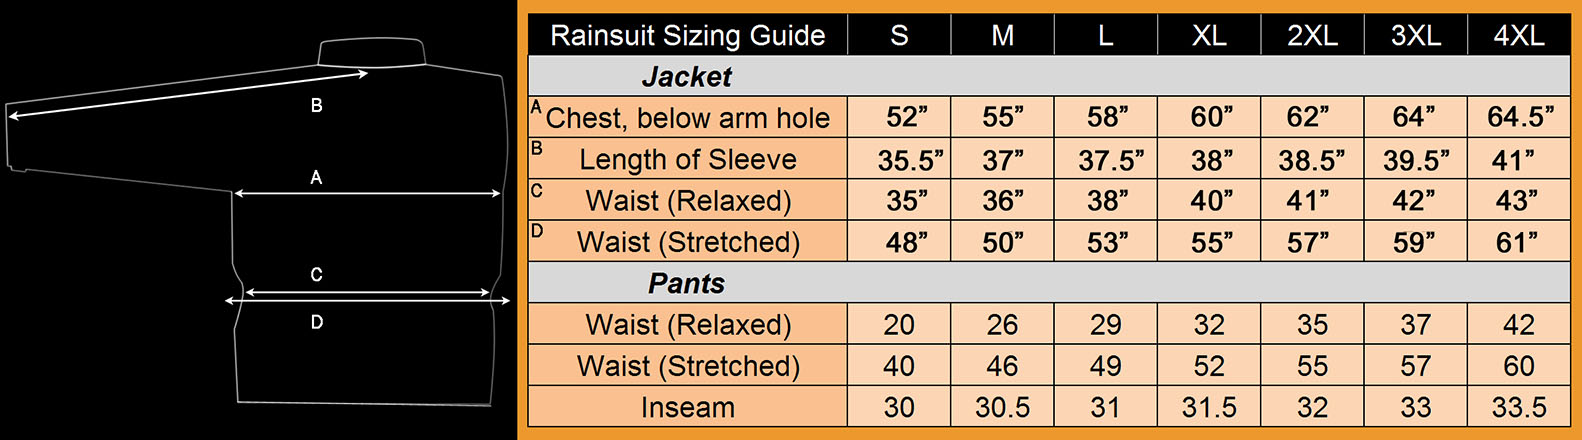 Rainwear fitting guide